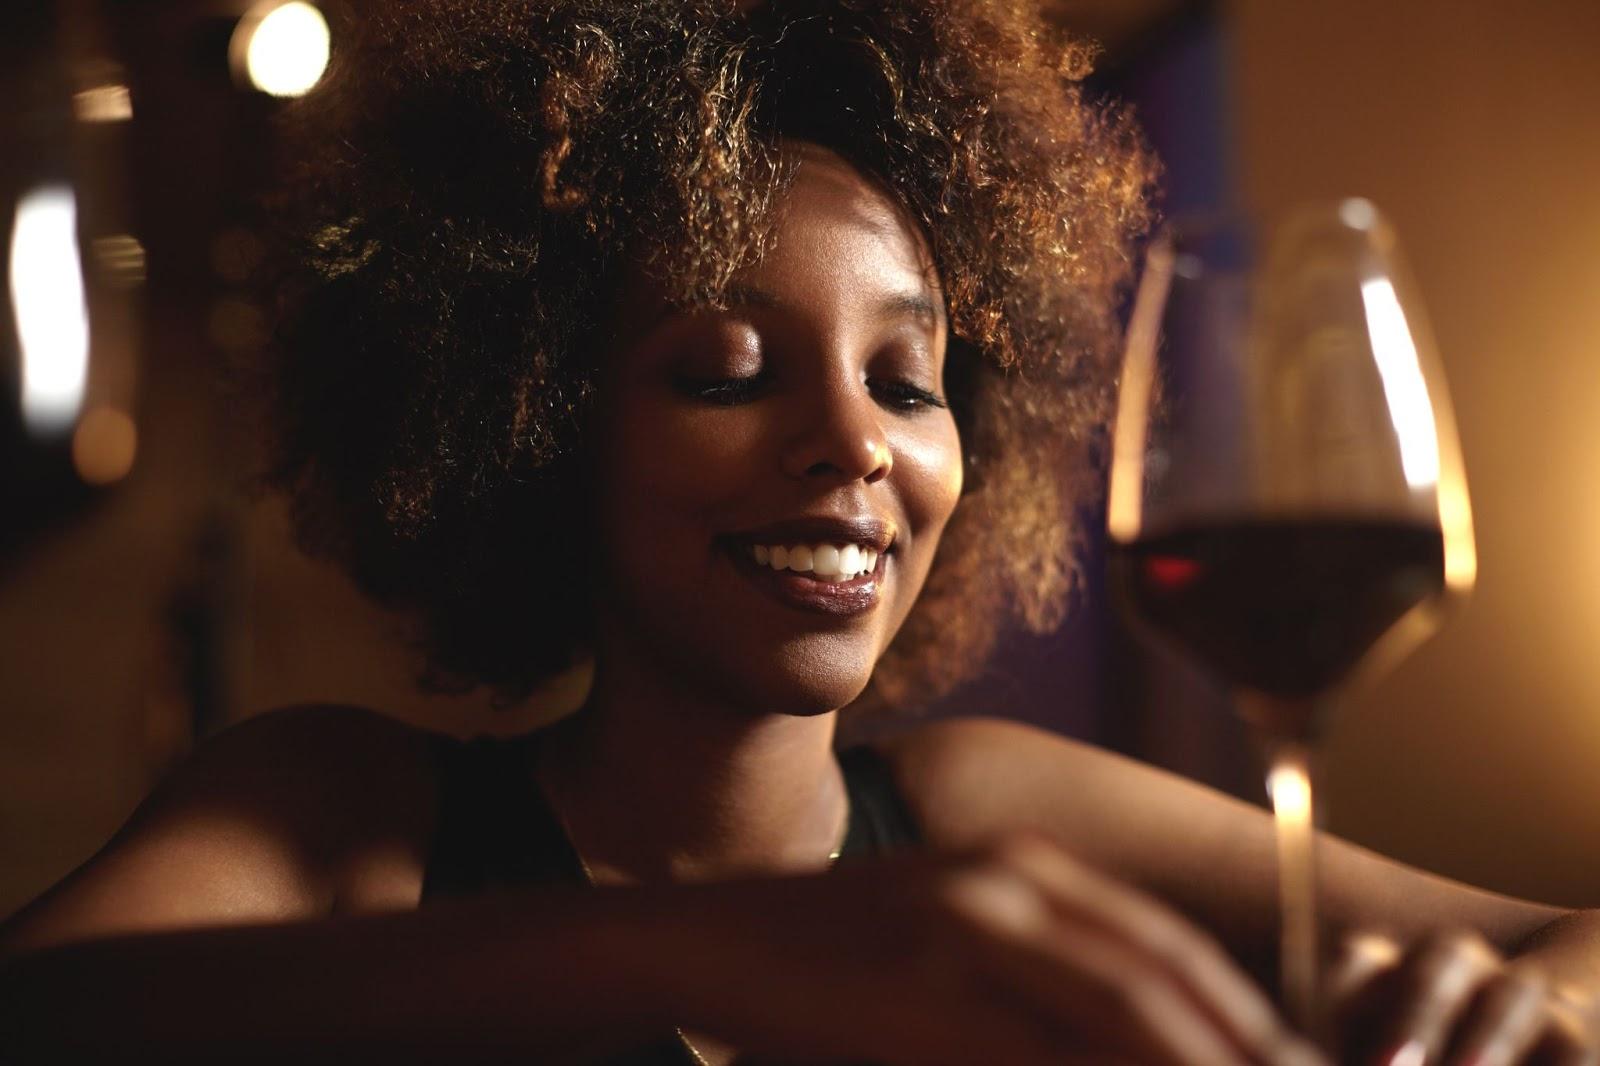 Mulher degustando vinho